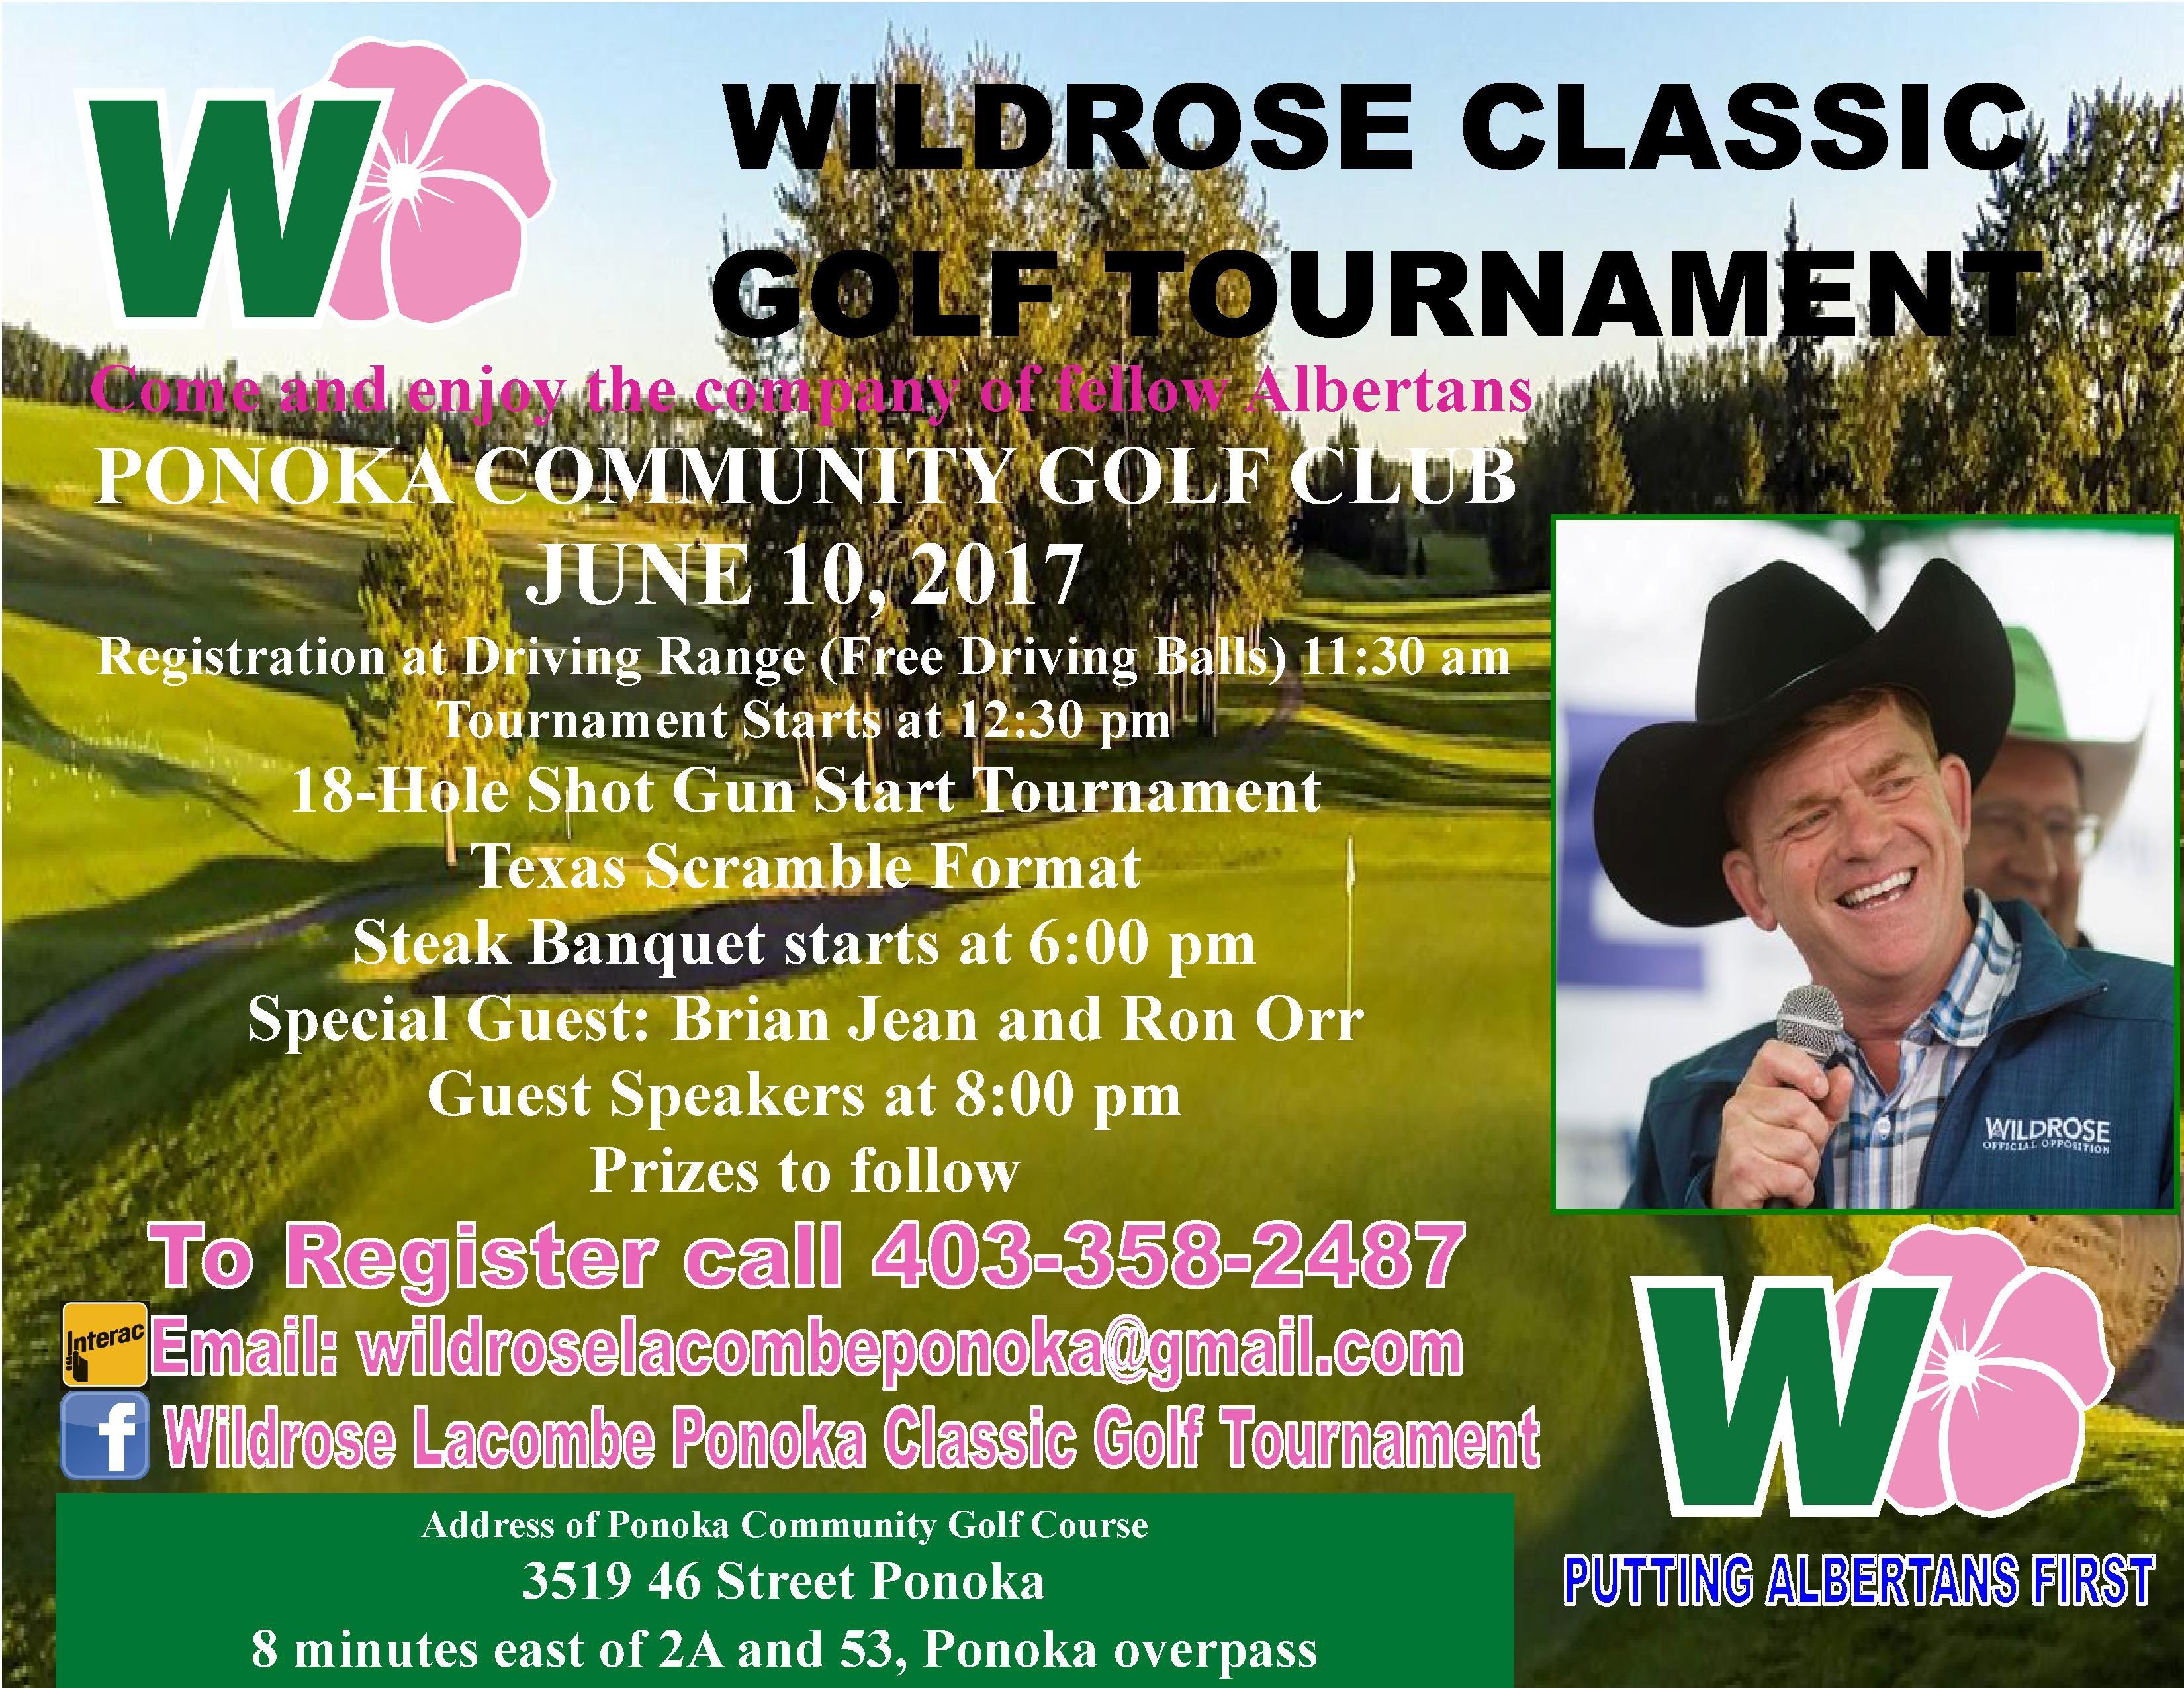 Wildrose_Golf_Tournament.jpg